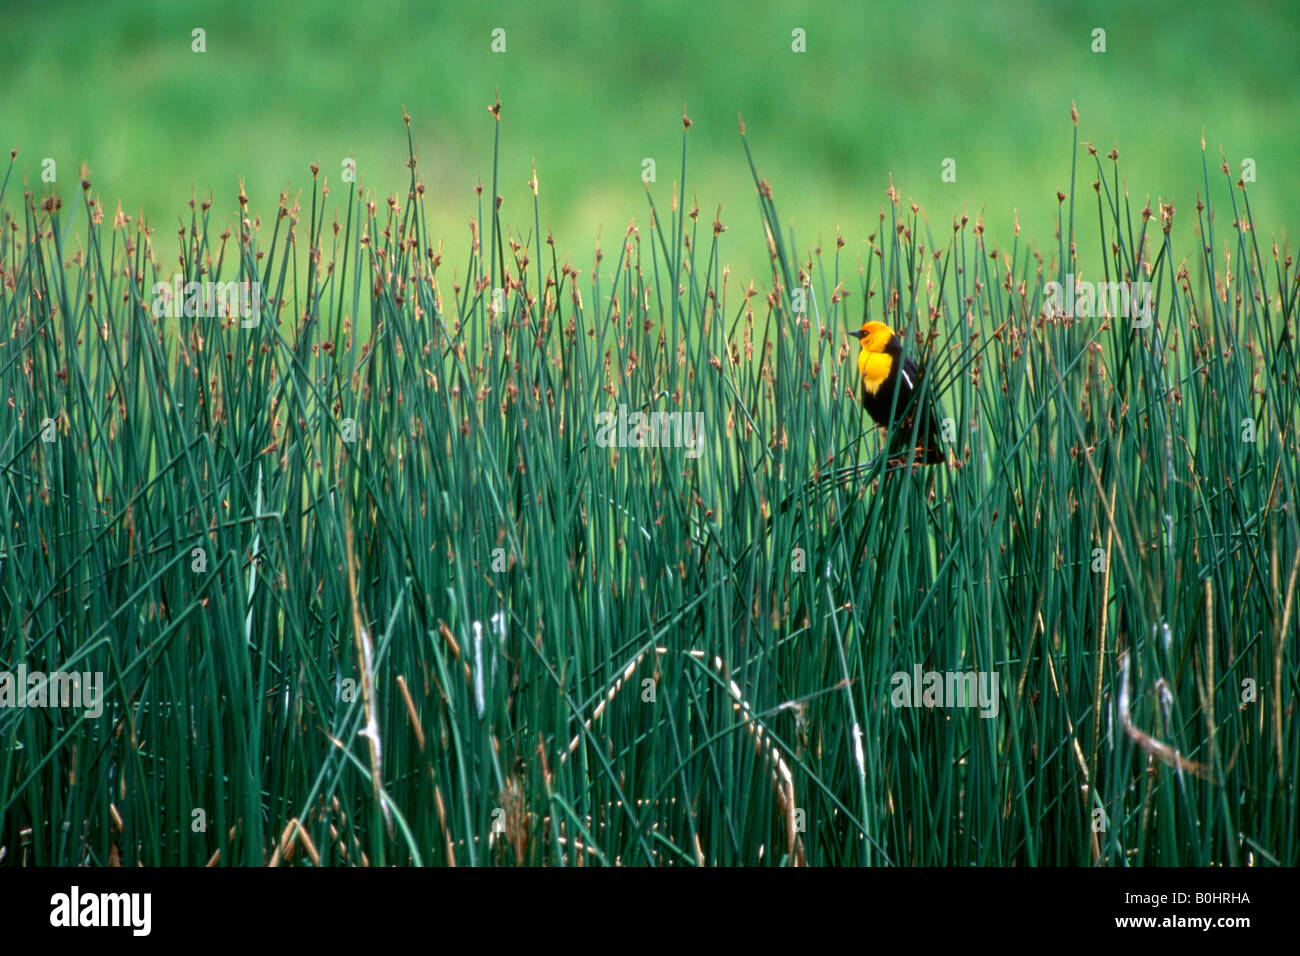 Yellow-headed Blackbird (Xanthocephalus xanthocephalus), Yellowstone National Park, Wyoming, USA, North America Stock Photo